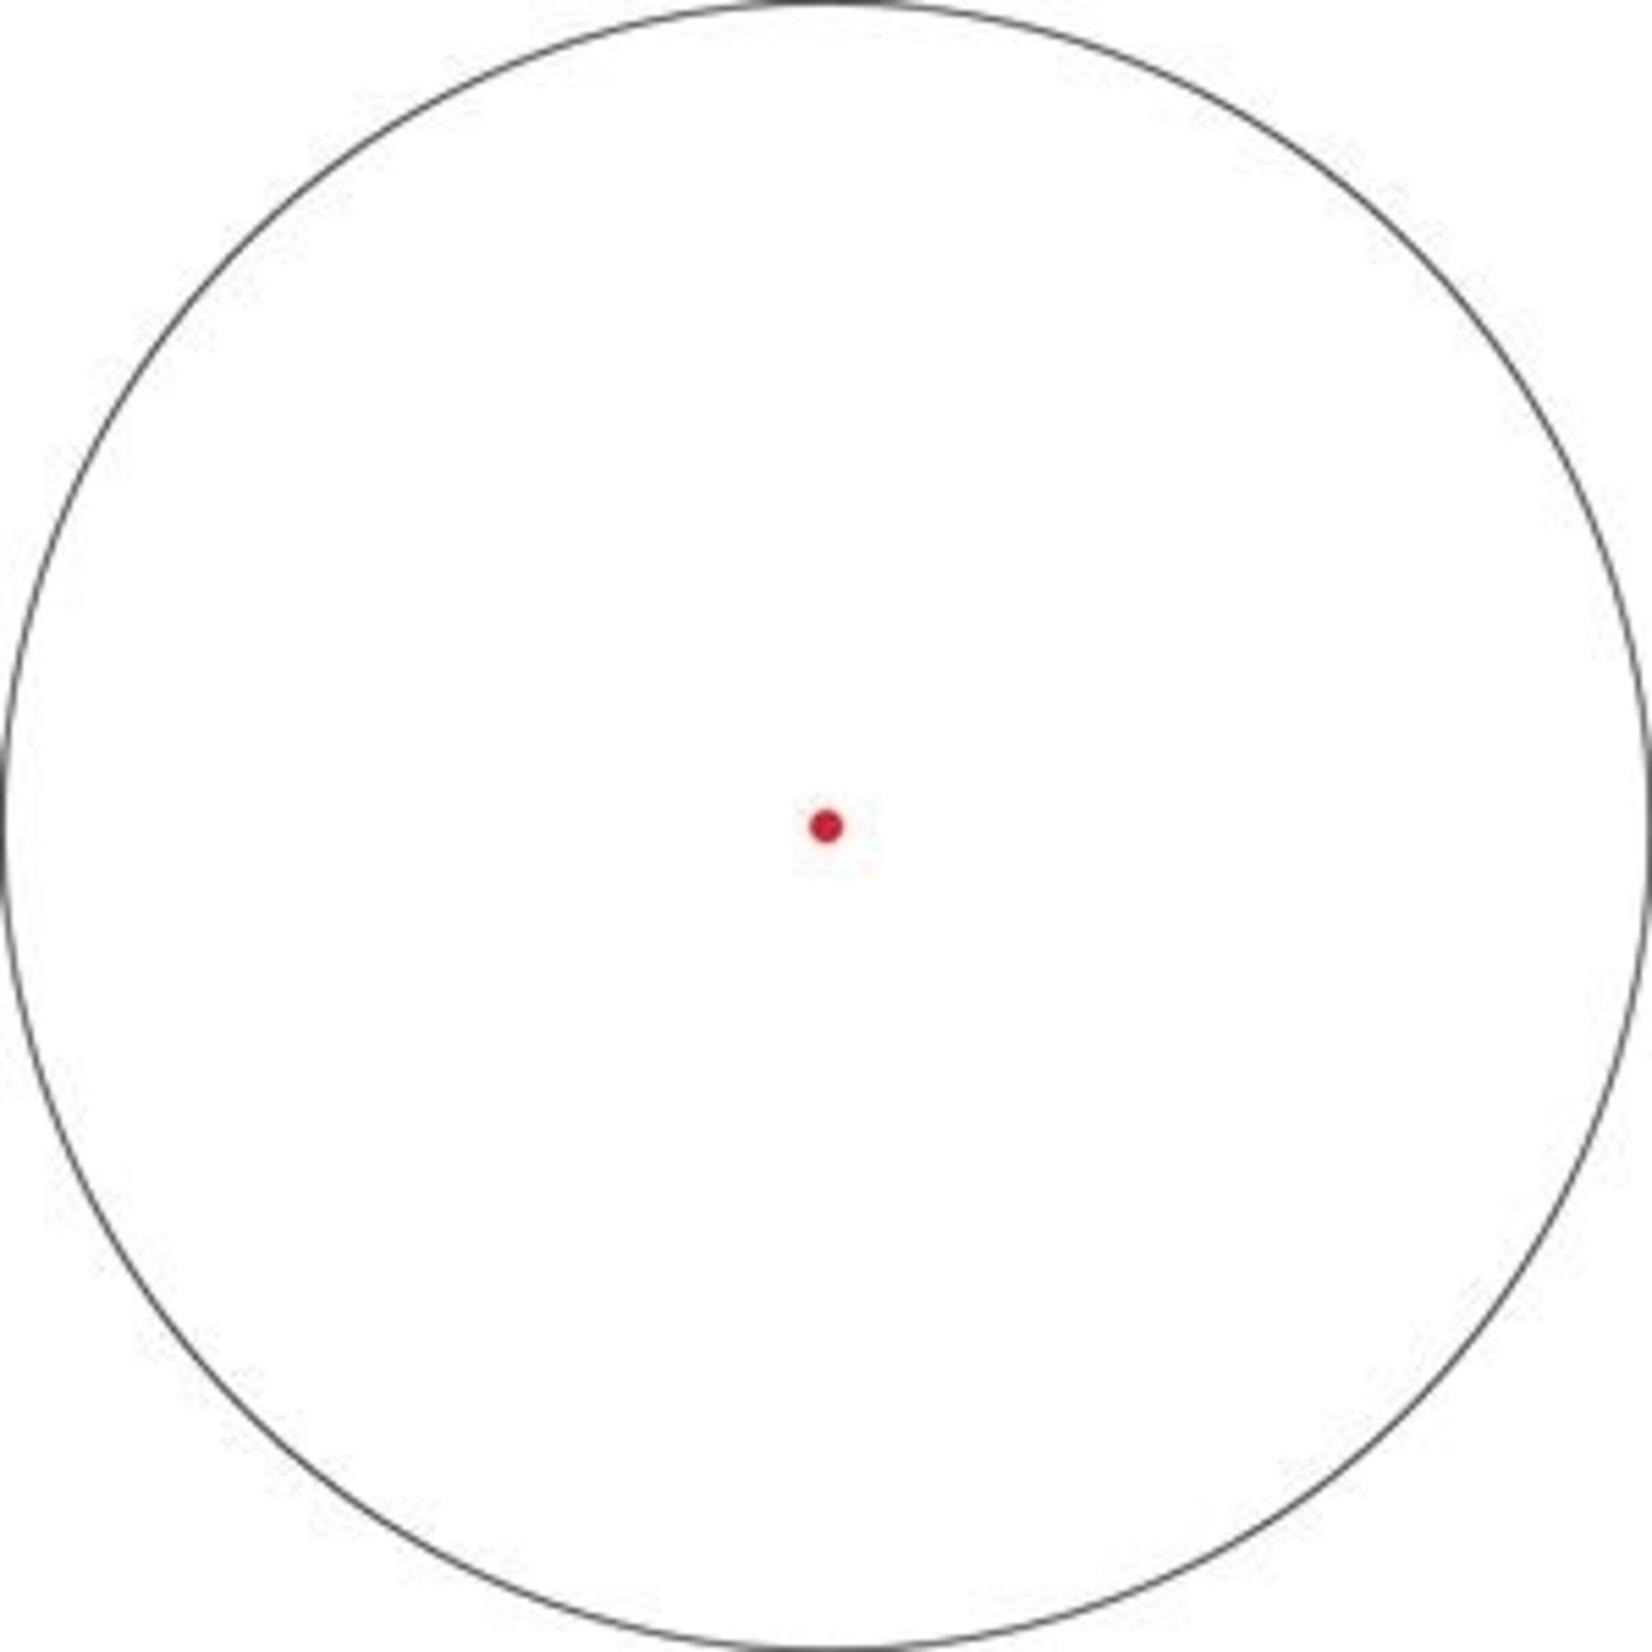 VORTEX Vortex SPARC AR Red Dot 2MOA (SPC-AR2)